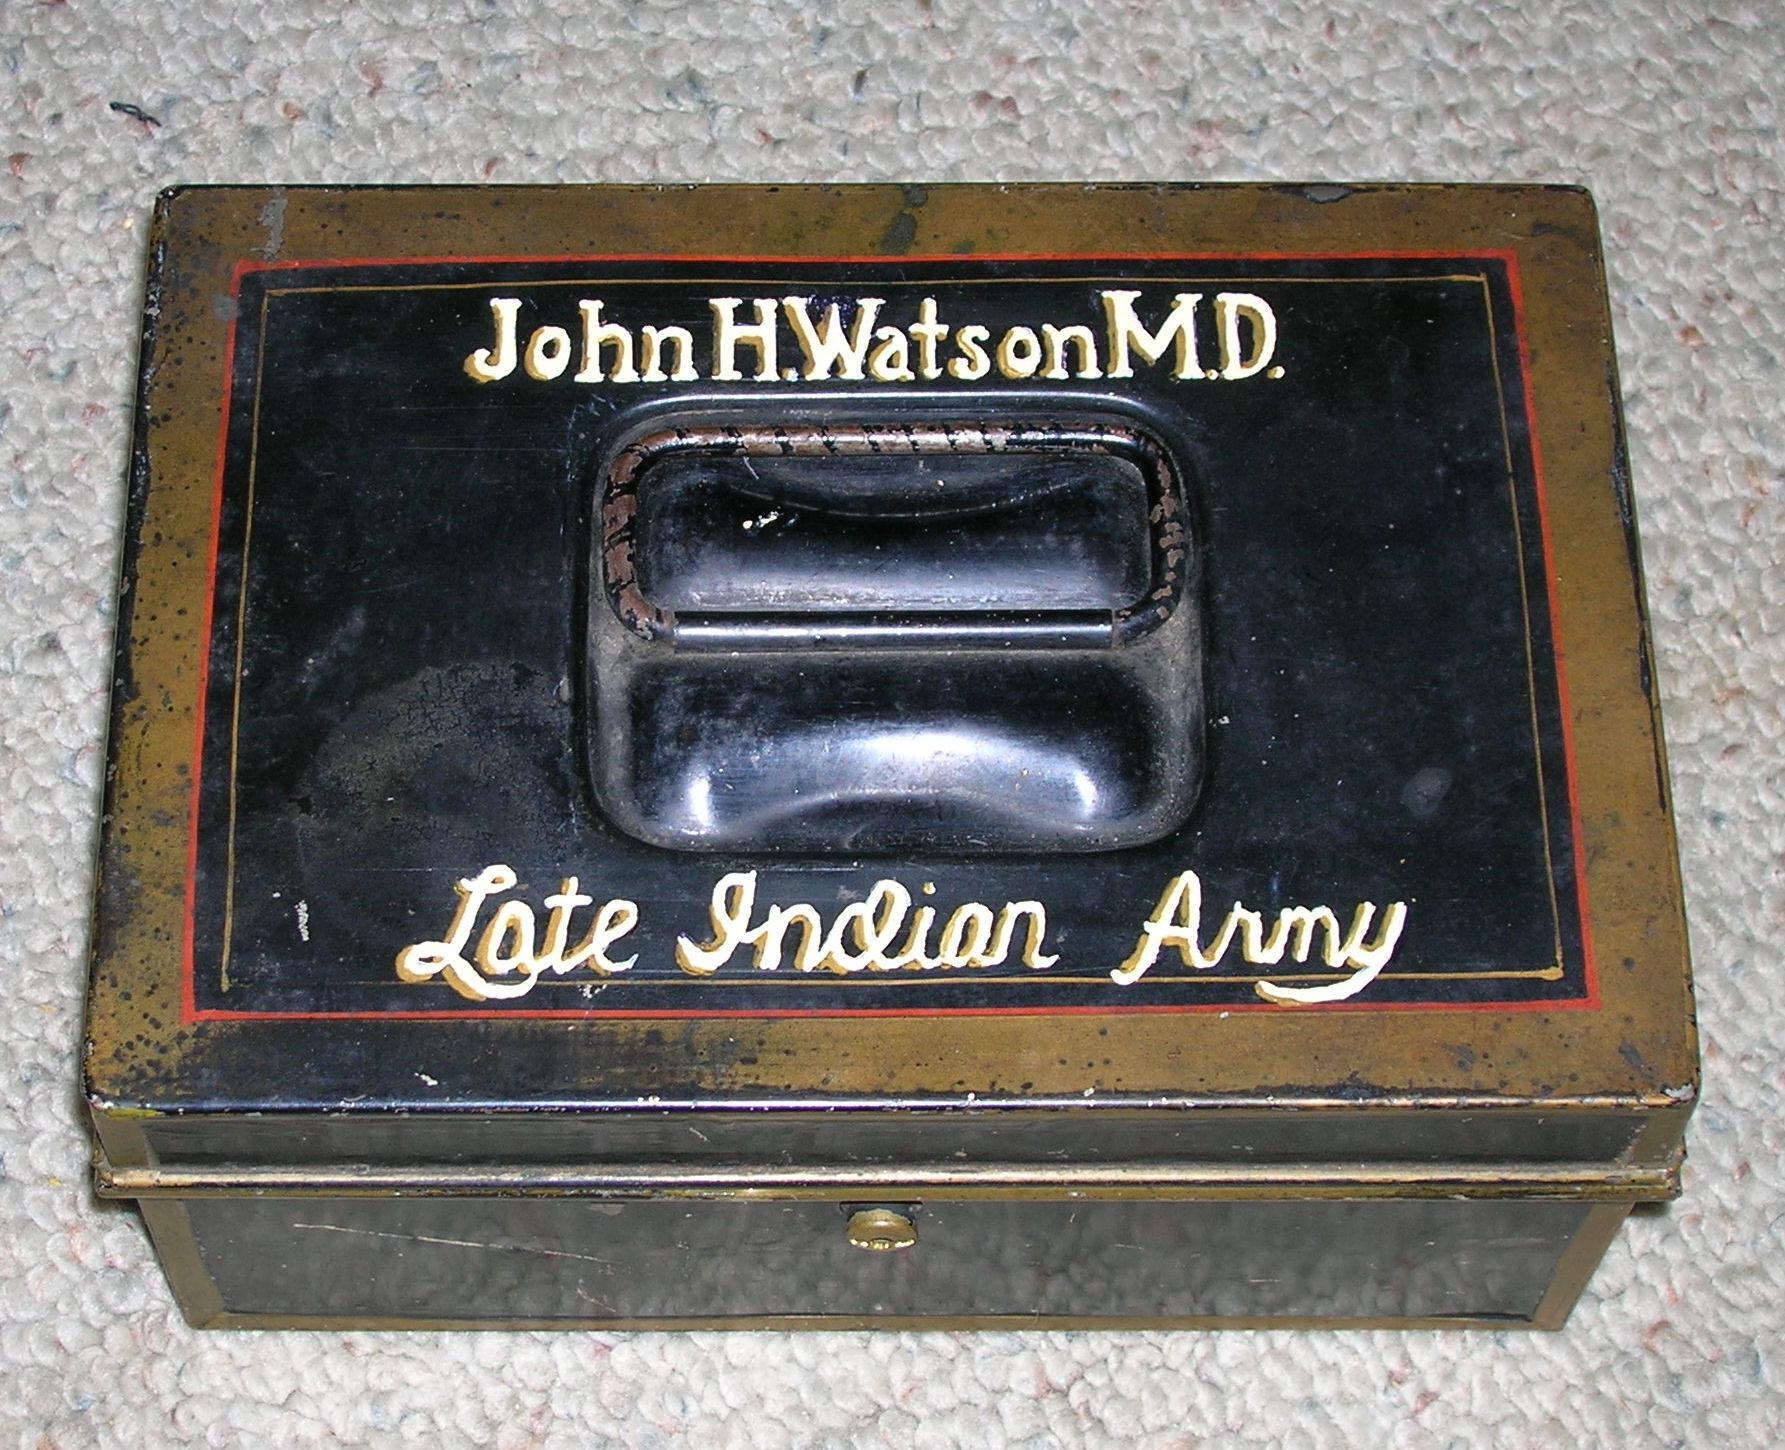 From Watson's Tin Box: The Creeping Man